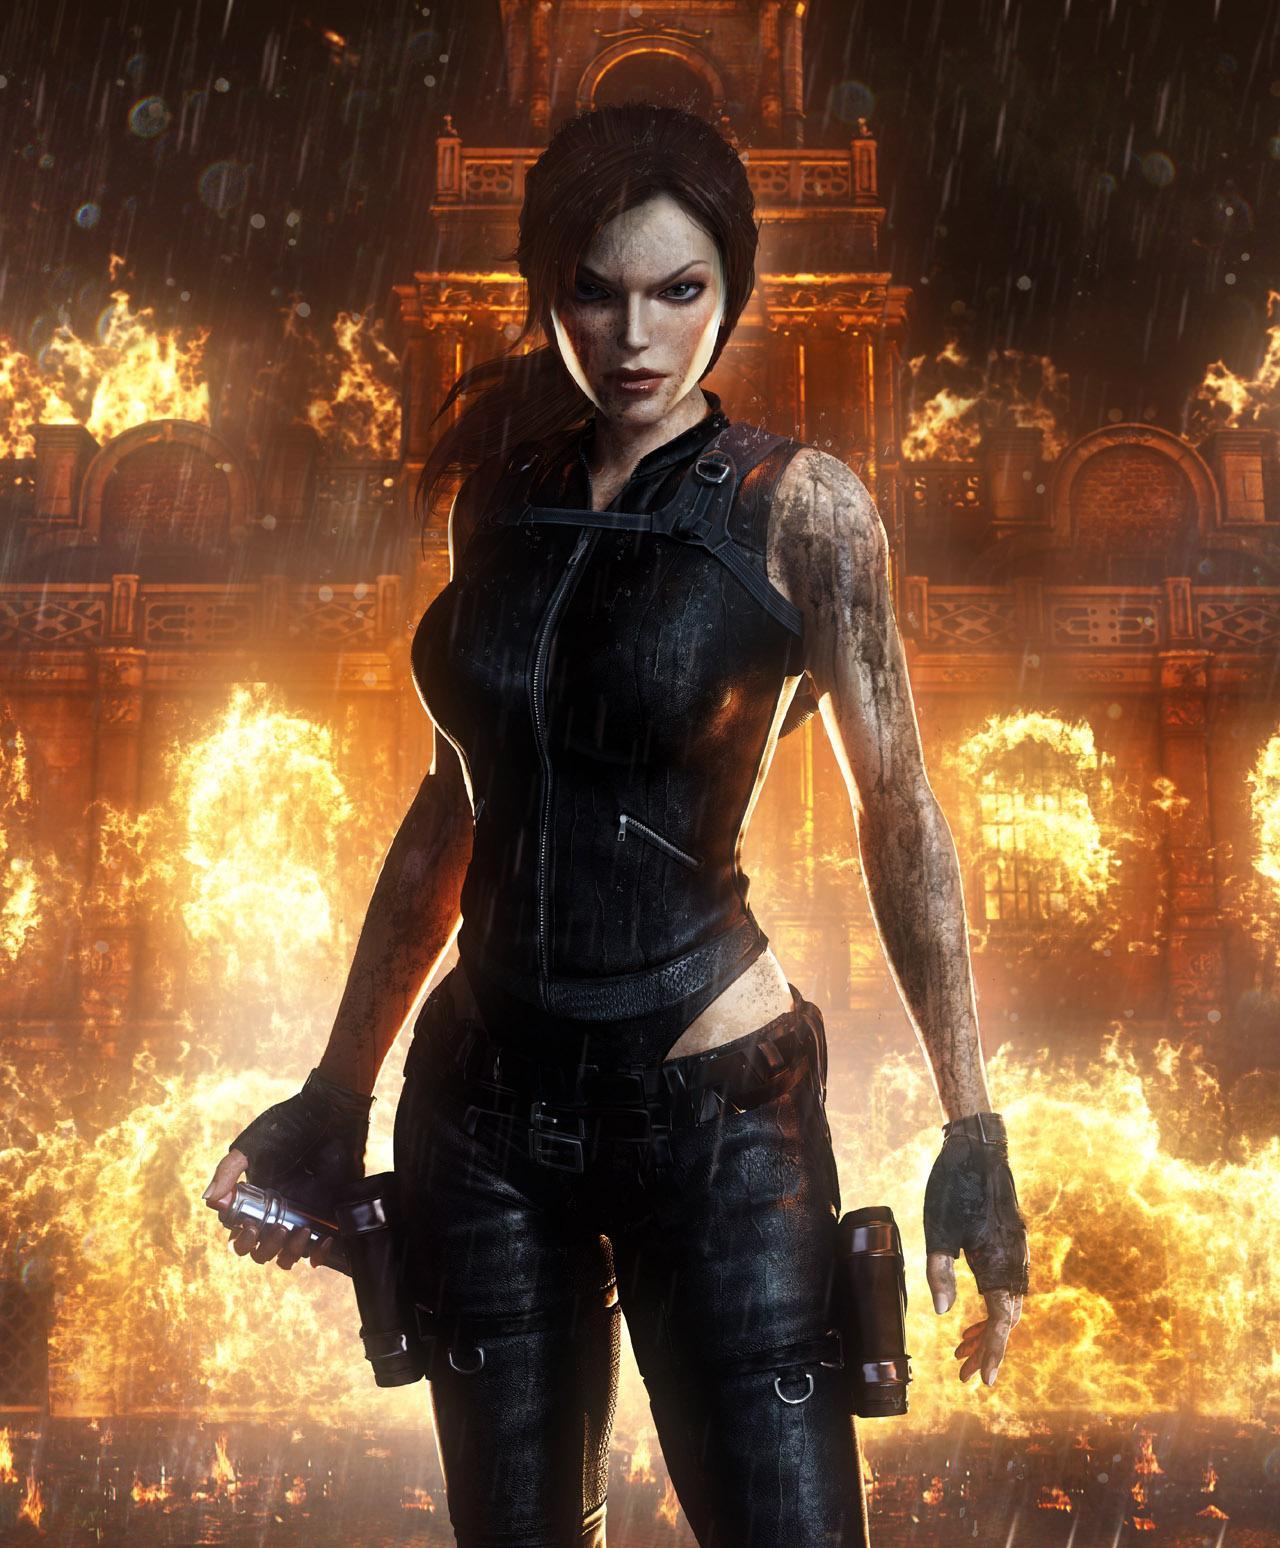 Tomb Rider Wallpaper: Does New Lara Look Japanese?